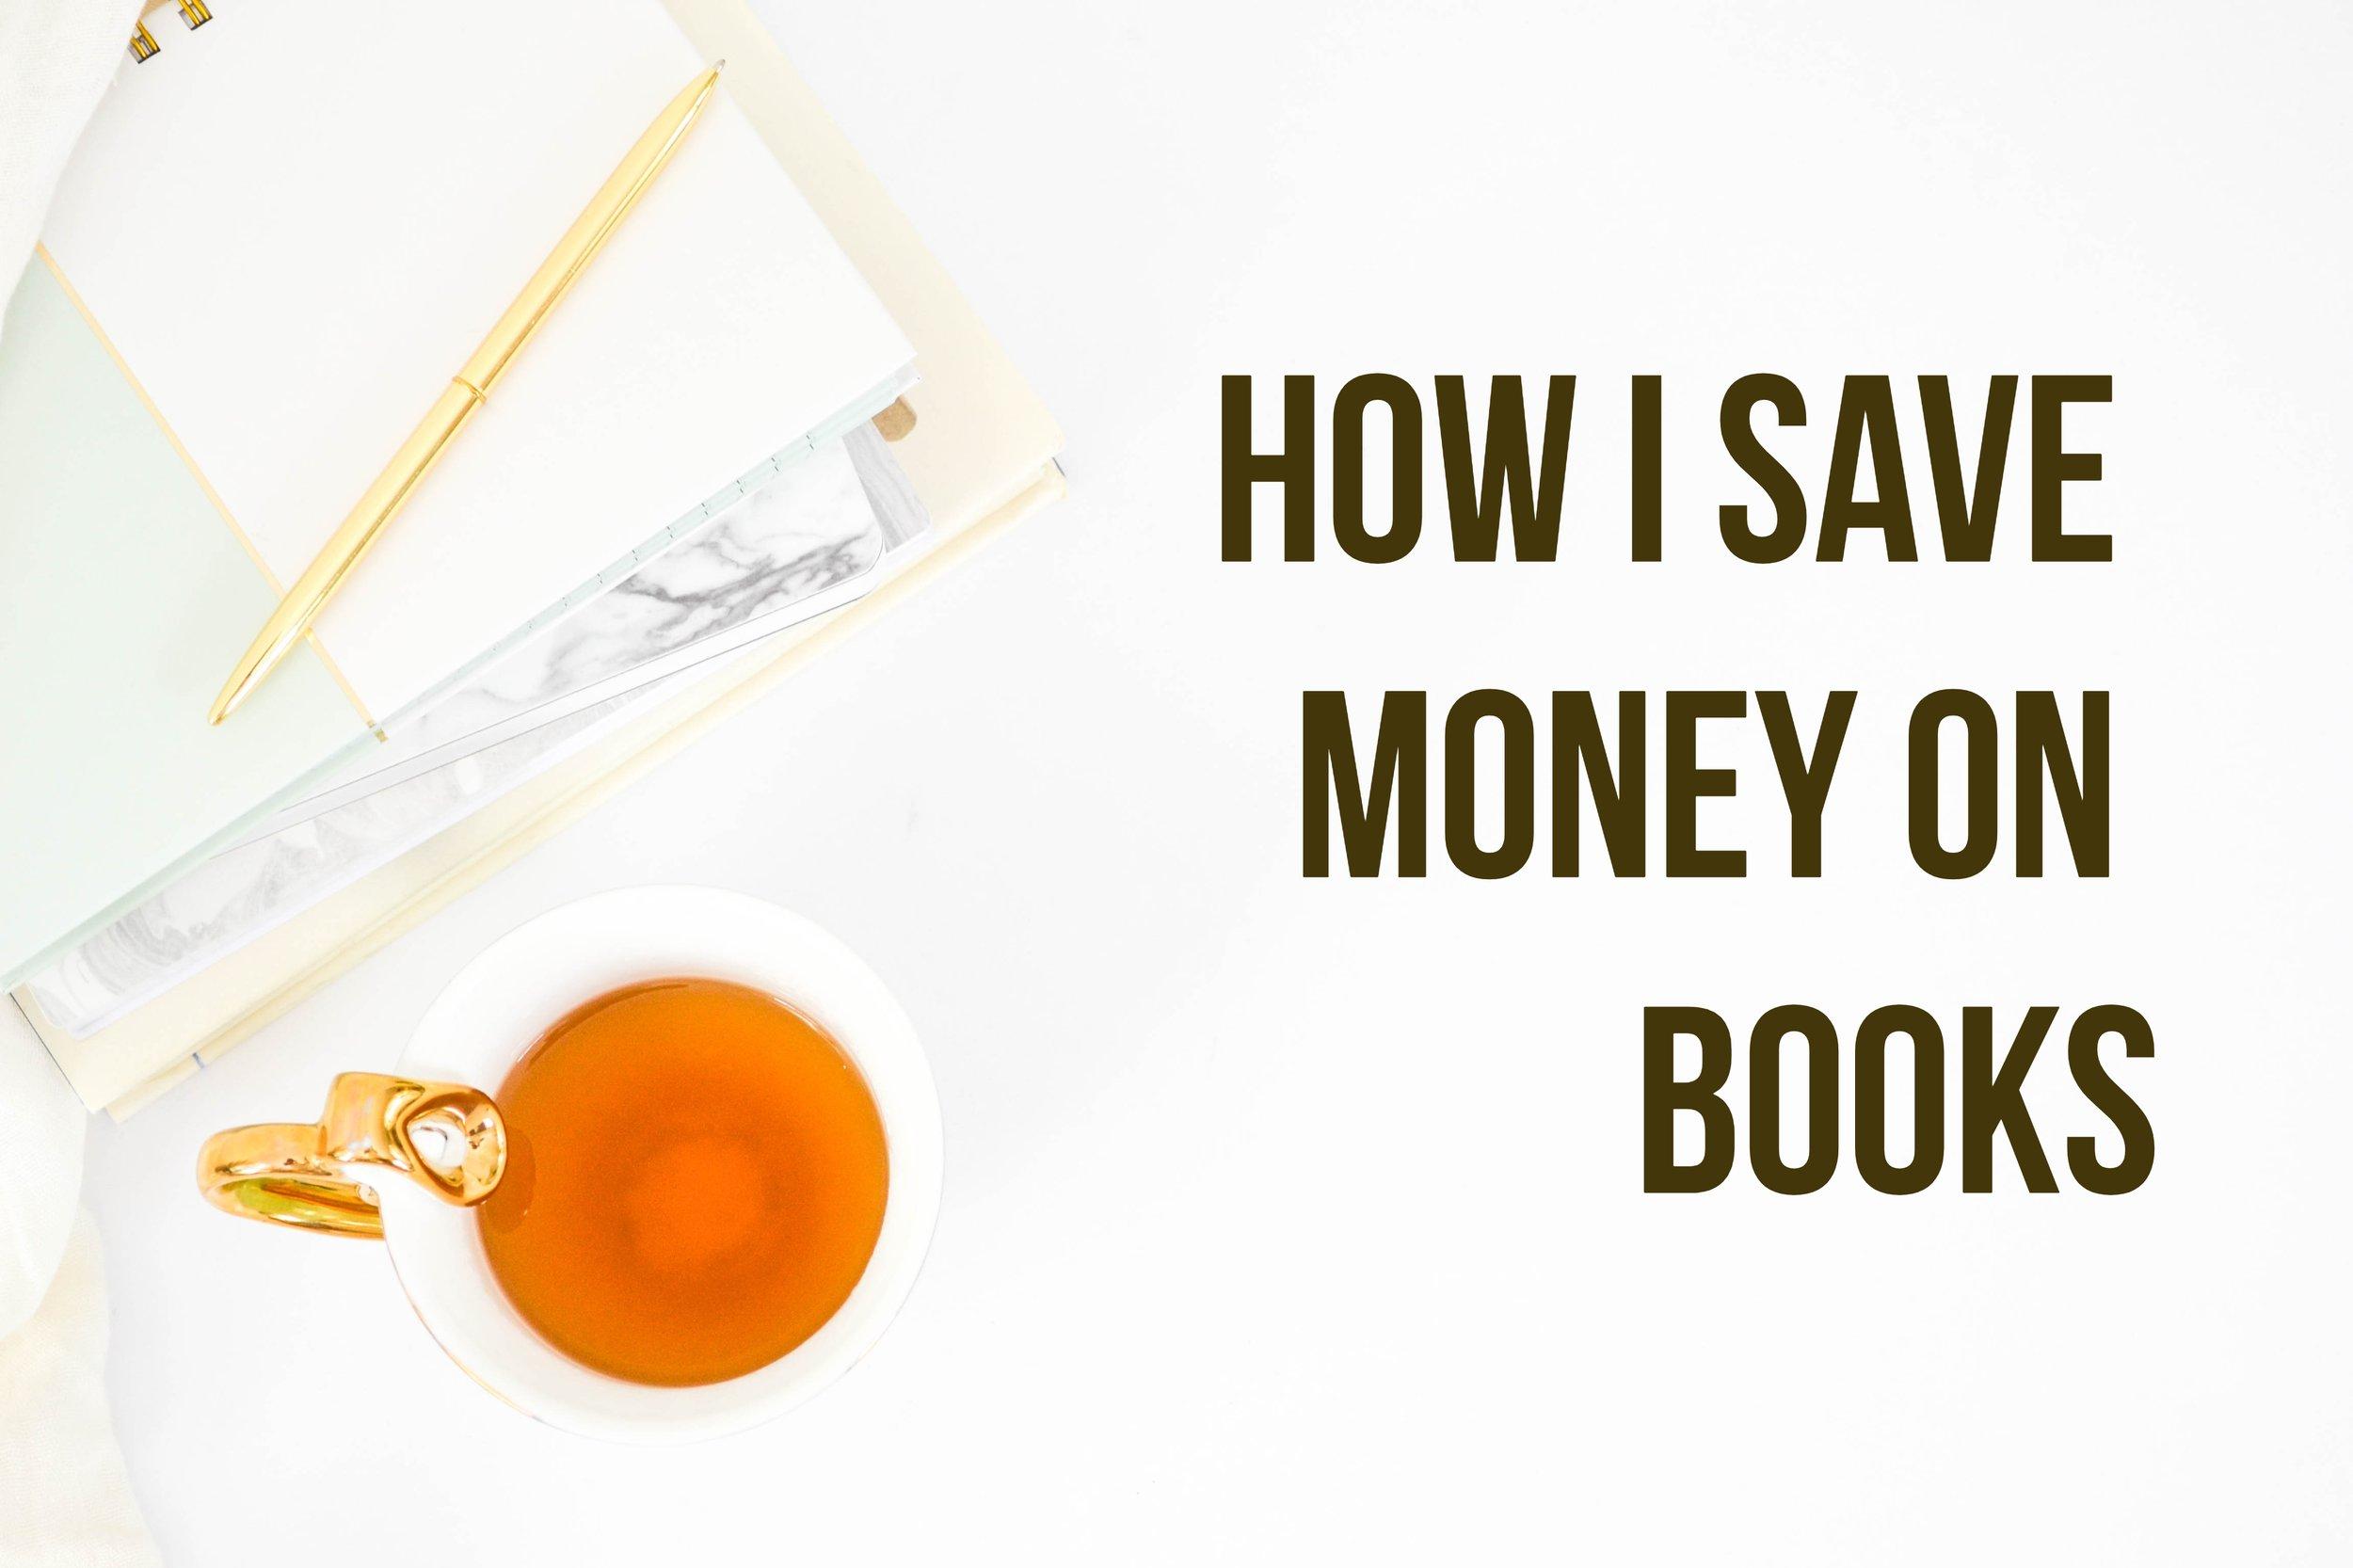 save money on books.jpg